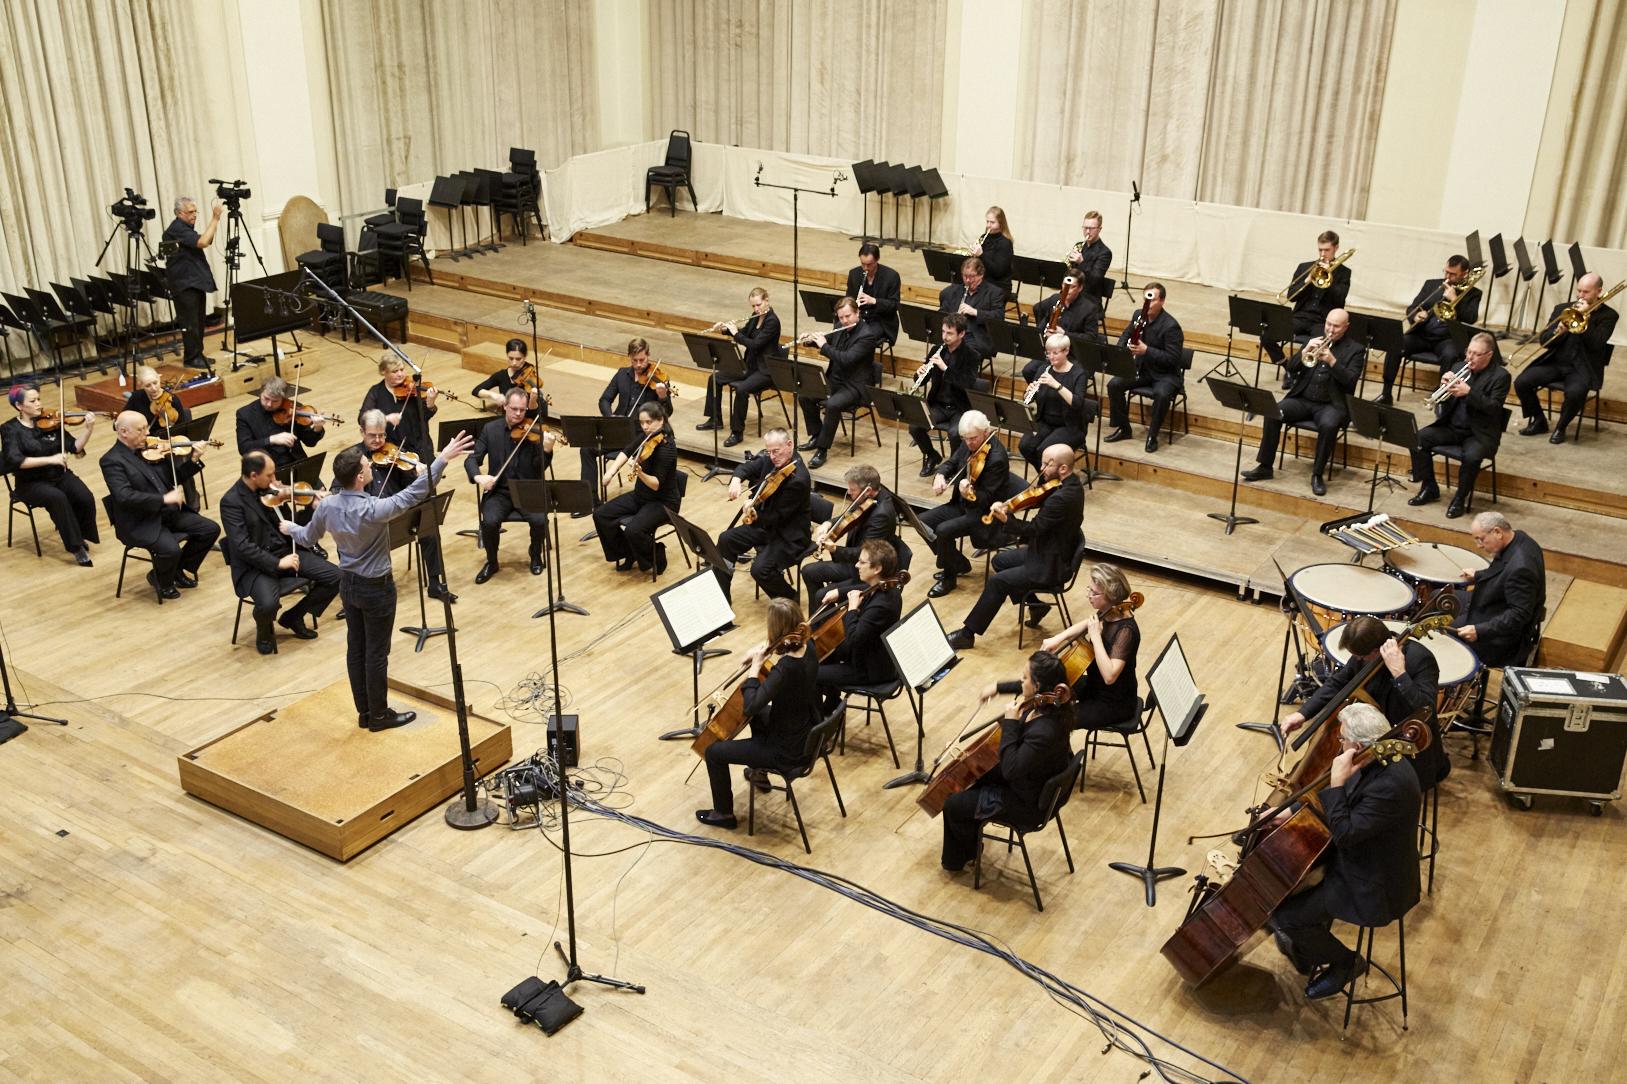 Scott Ellaway_London Symphony Orchestra_01 (c) Kevin Leighton (large).jpeg